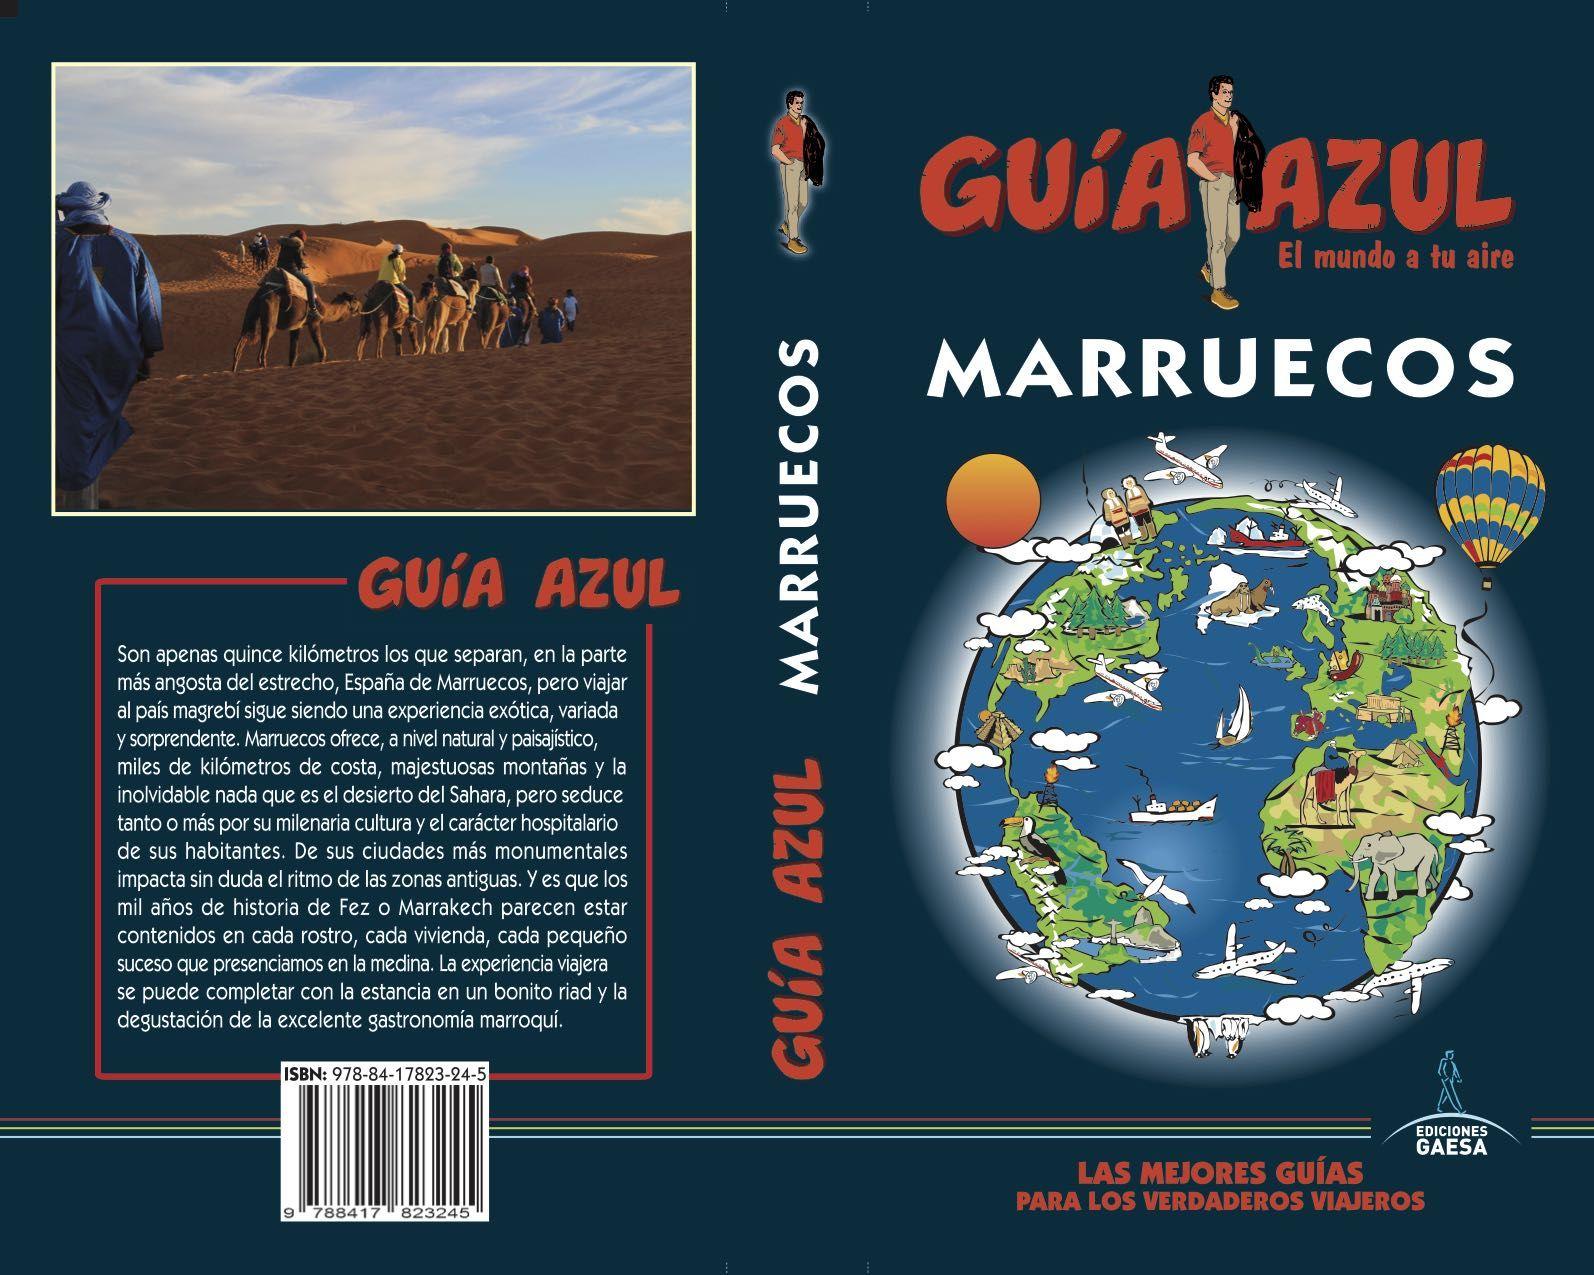 MARRUECOS GUIA AZUL